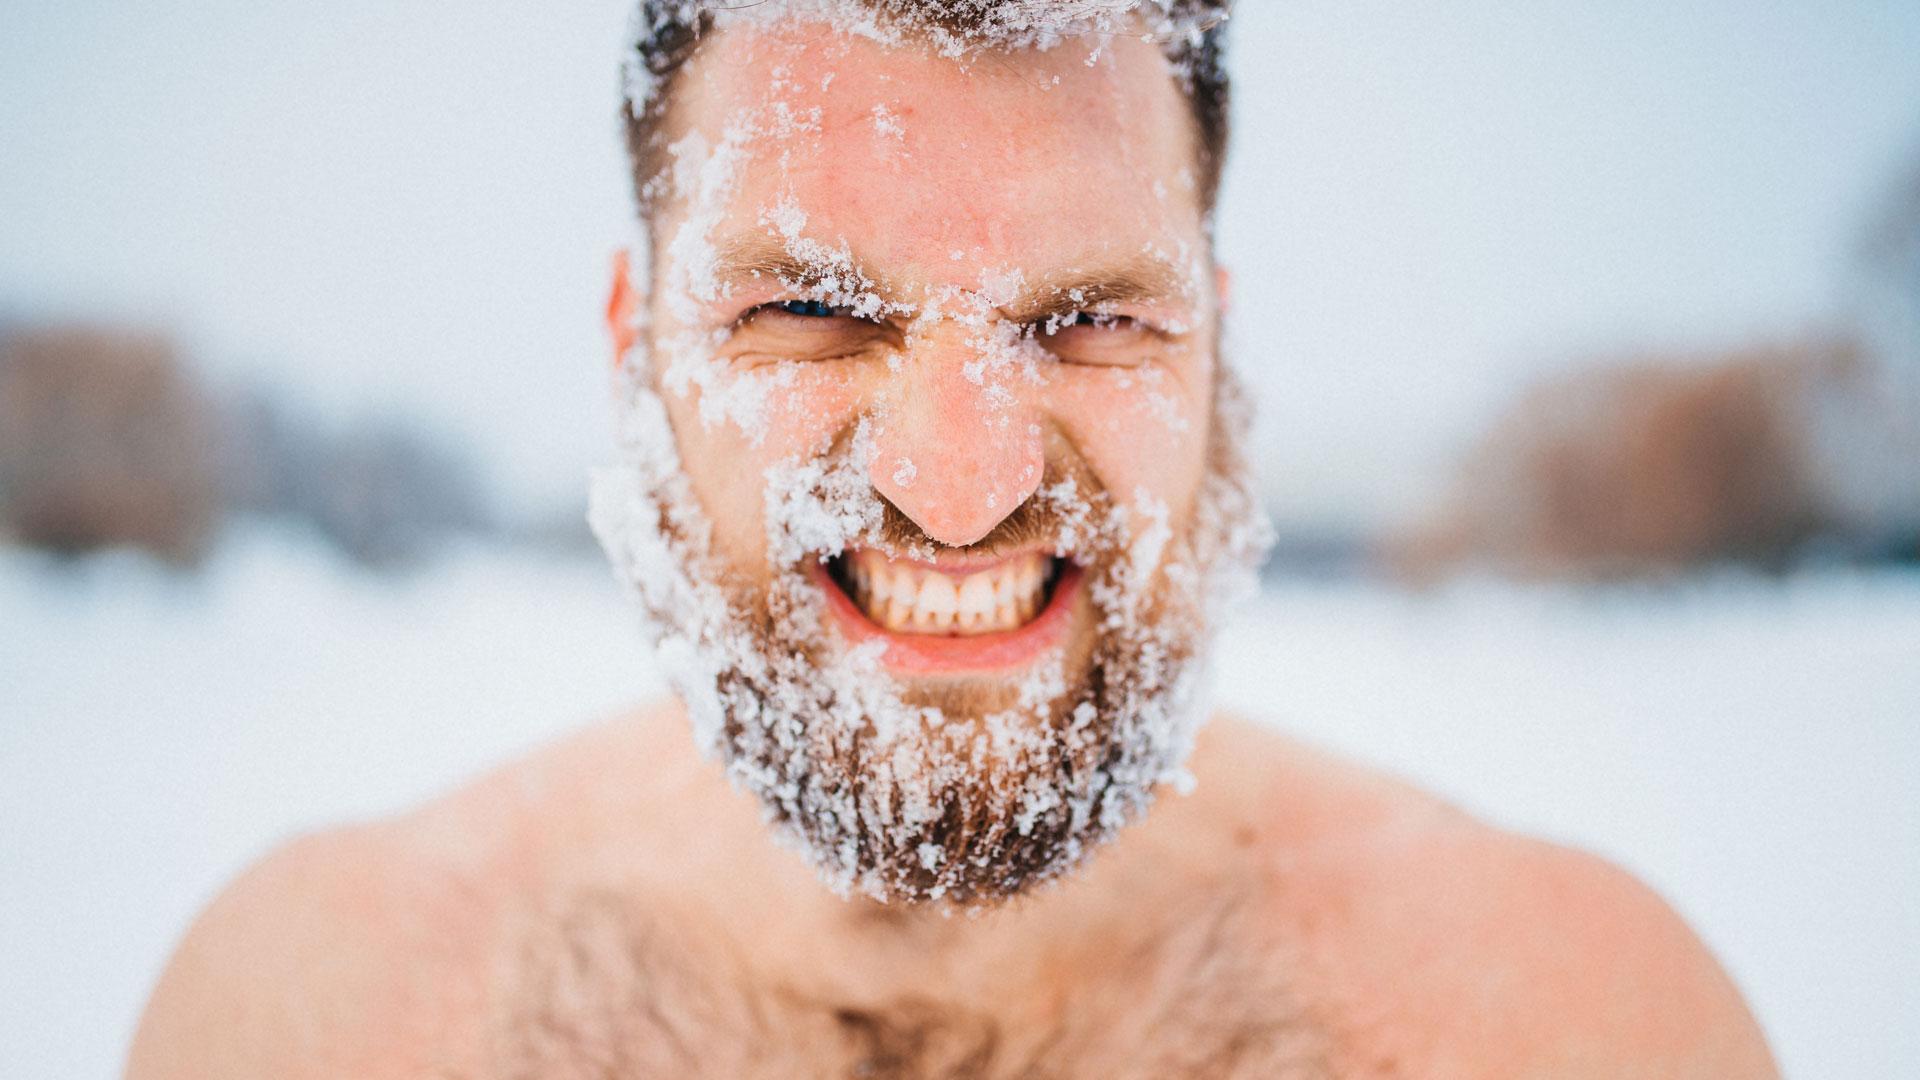 Mężczyzna-z-brodą-na-mrozie.jpg